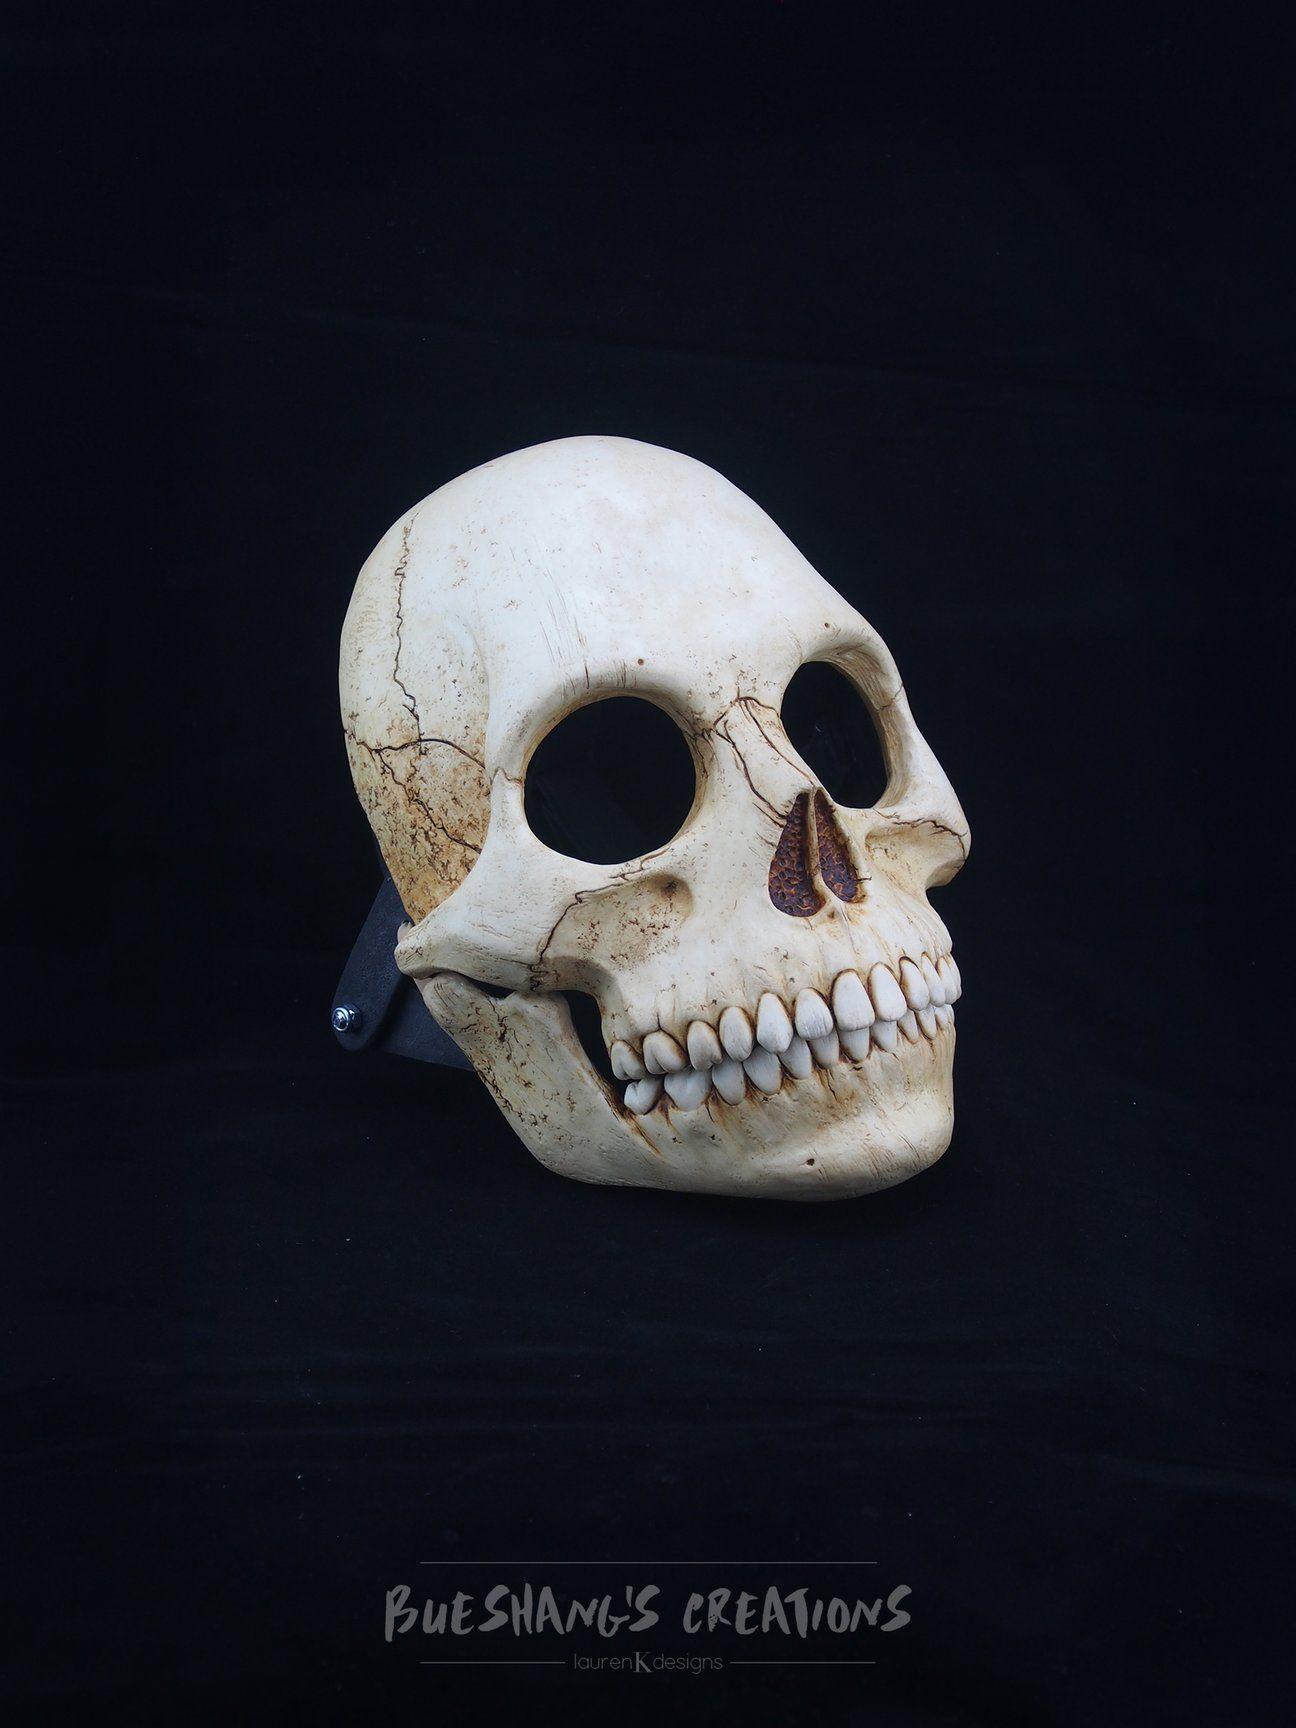 Human Skull Mask Full in 2020 Skull mask, Human skull